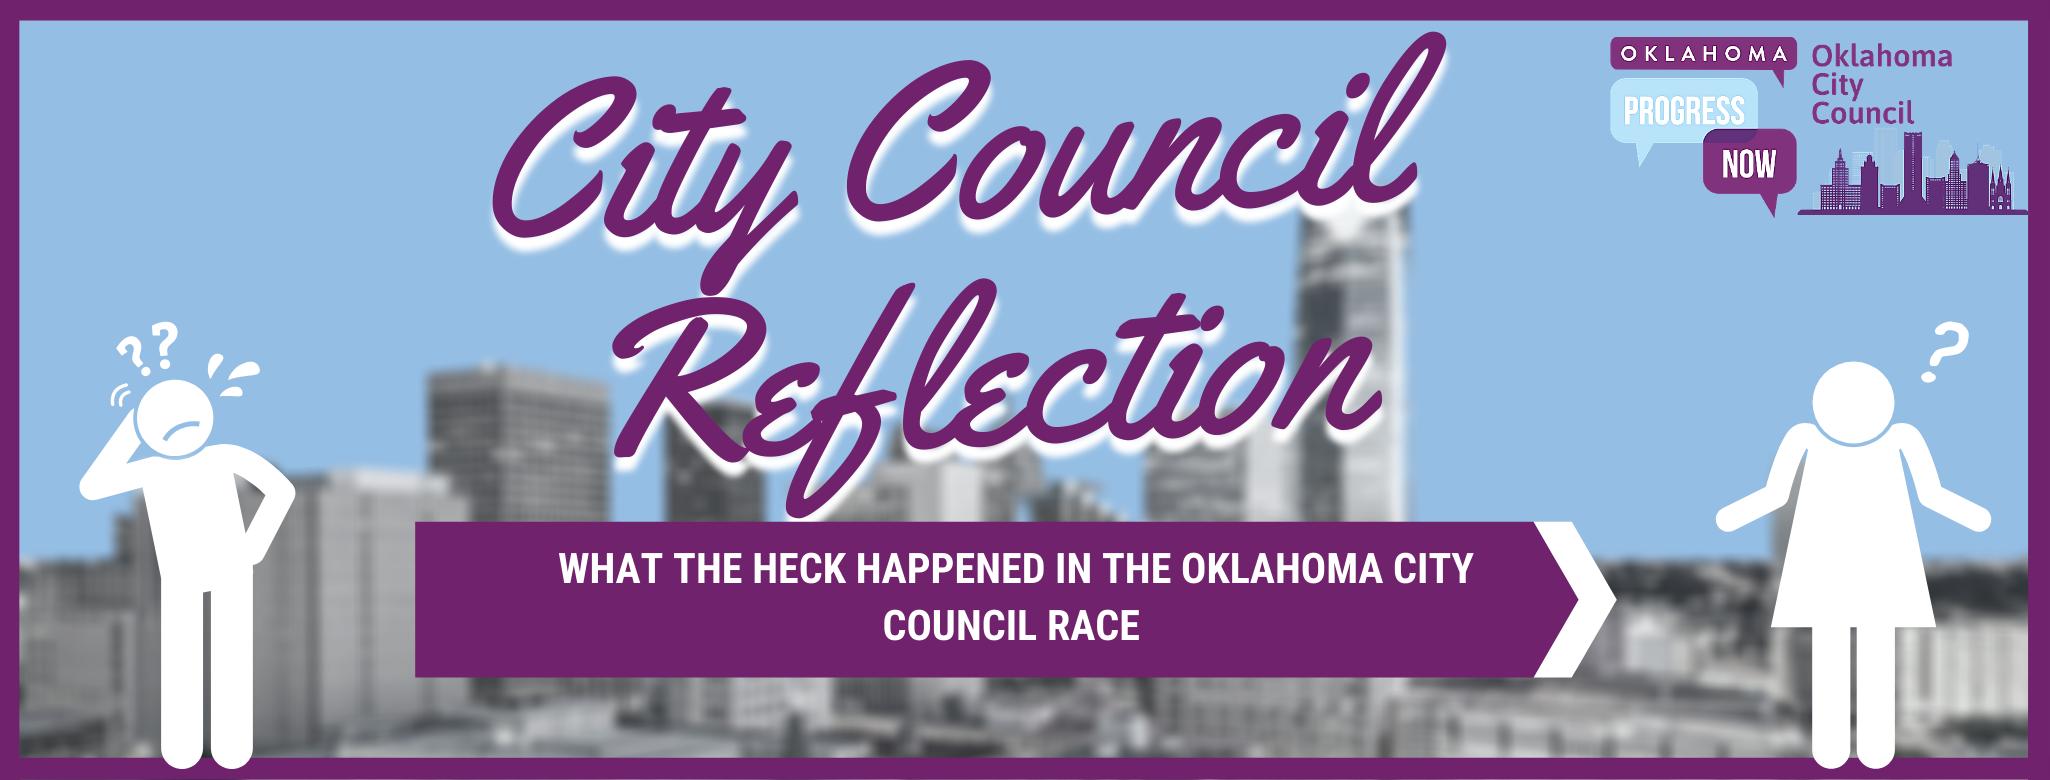 City Council Reflections